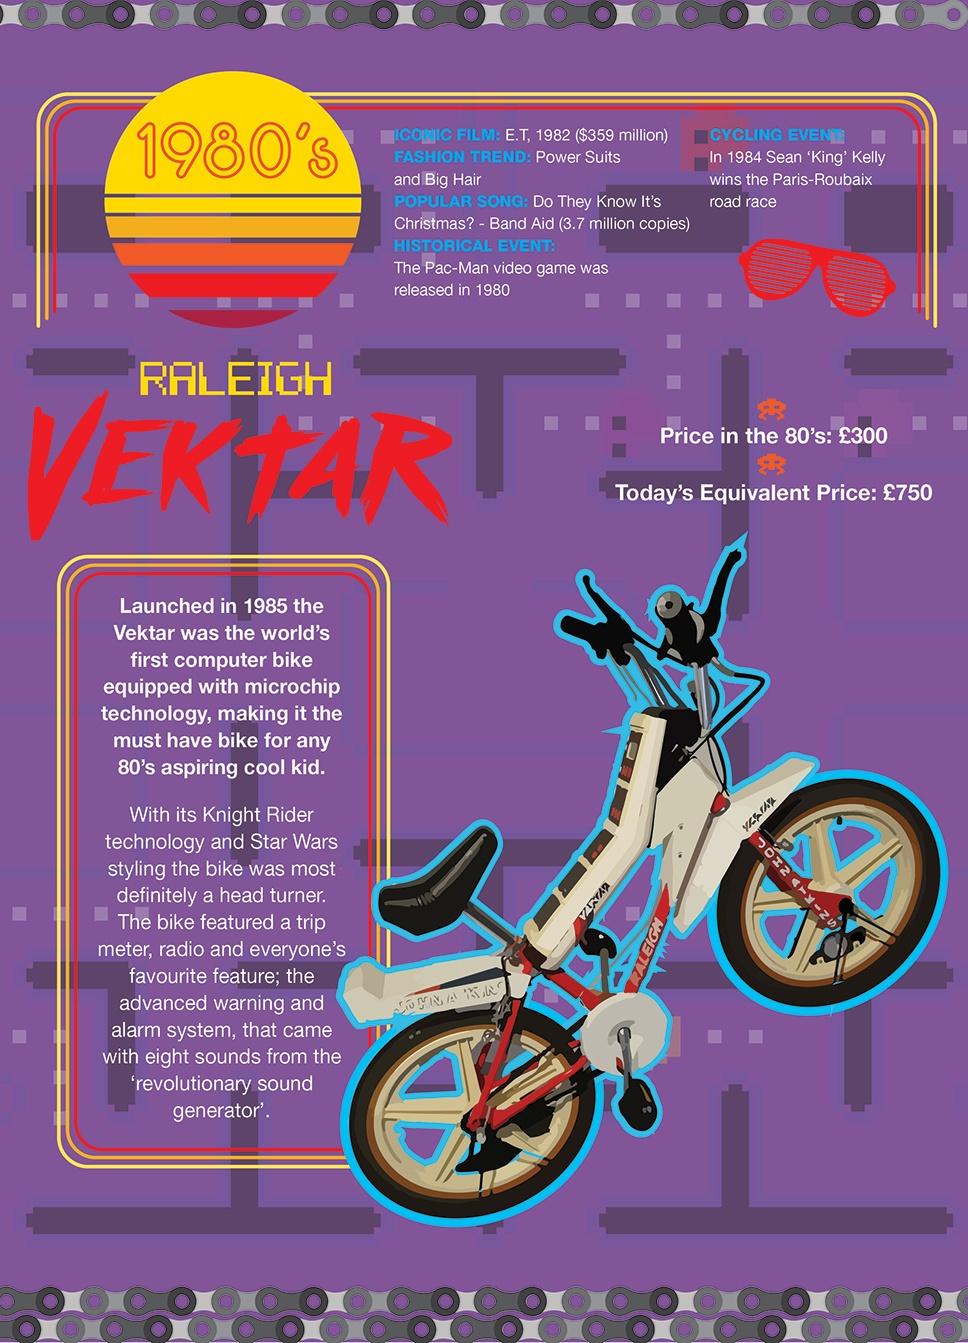 1980s Raleigh Vektar